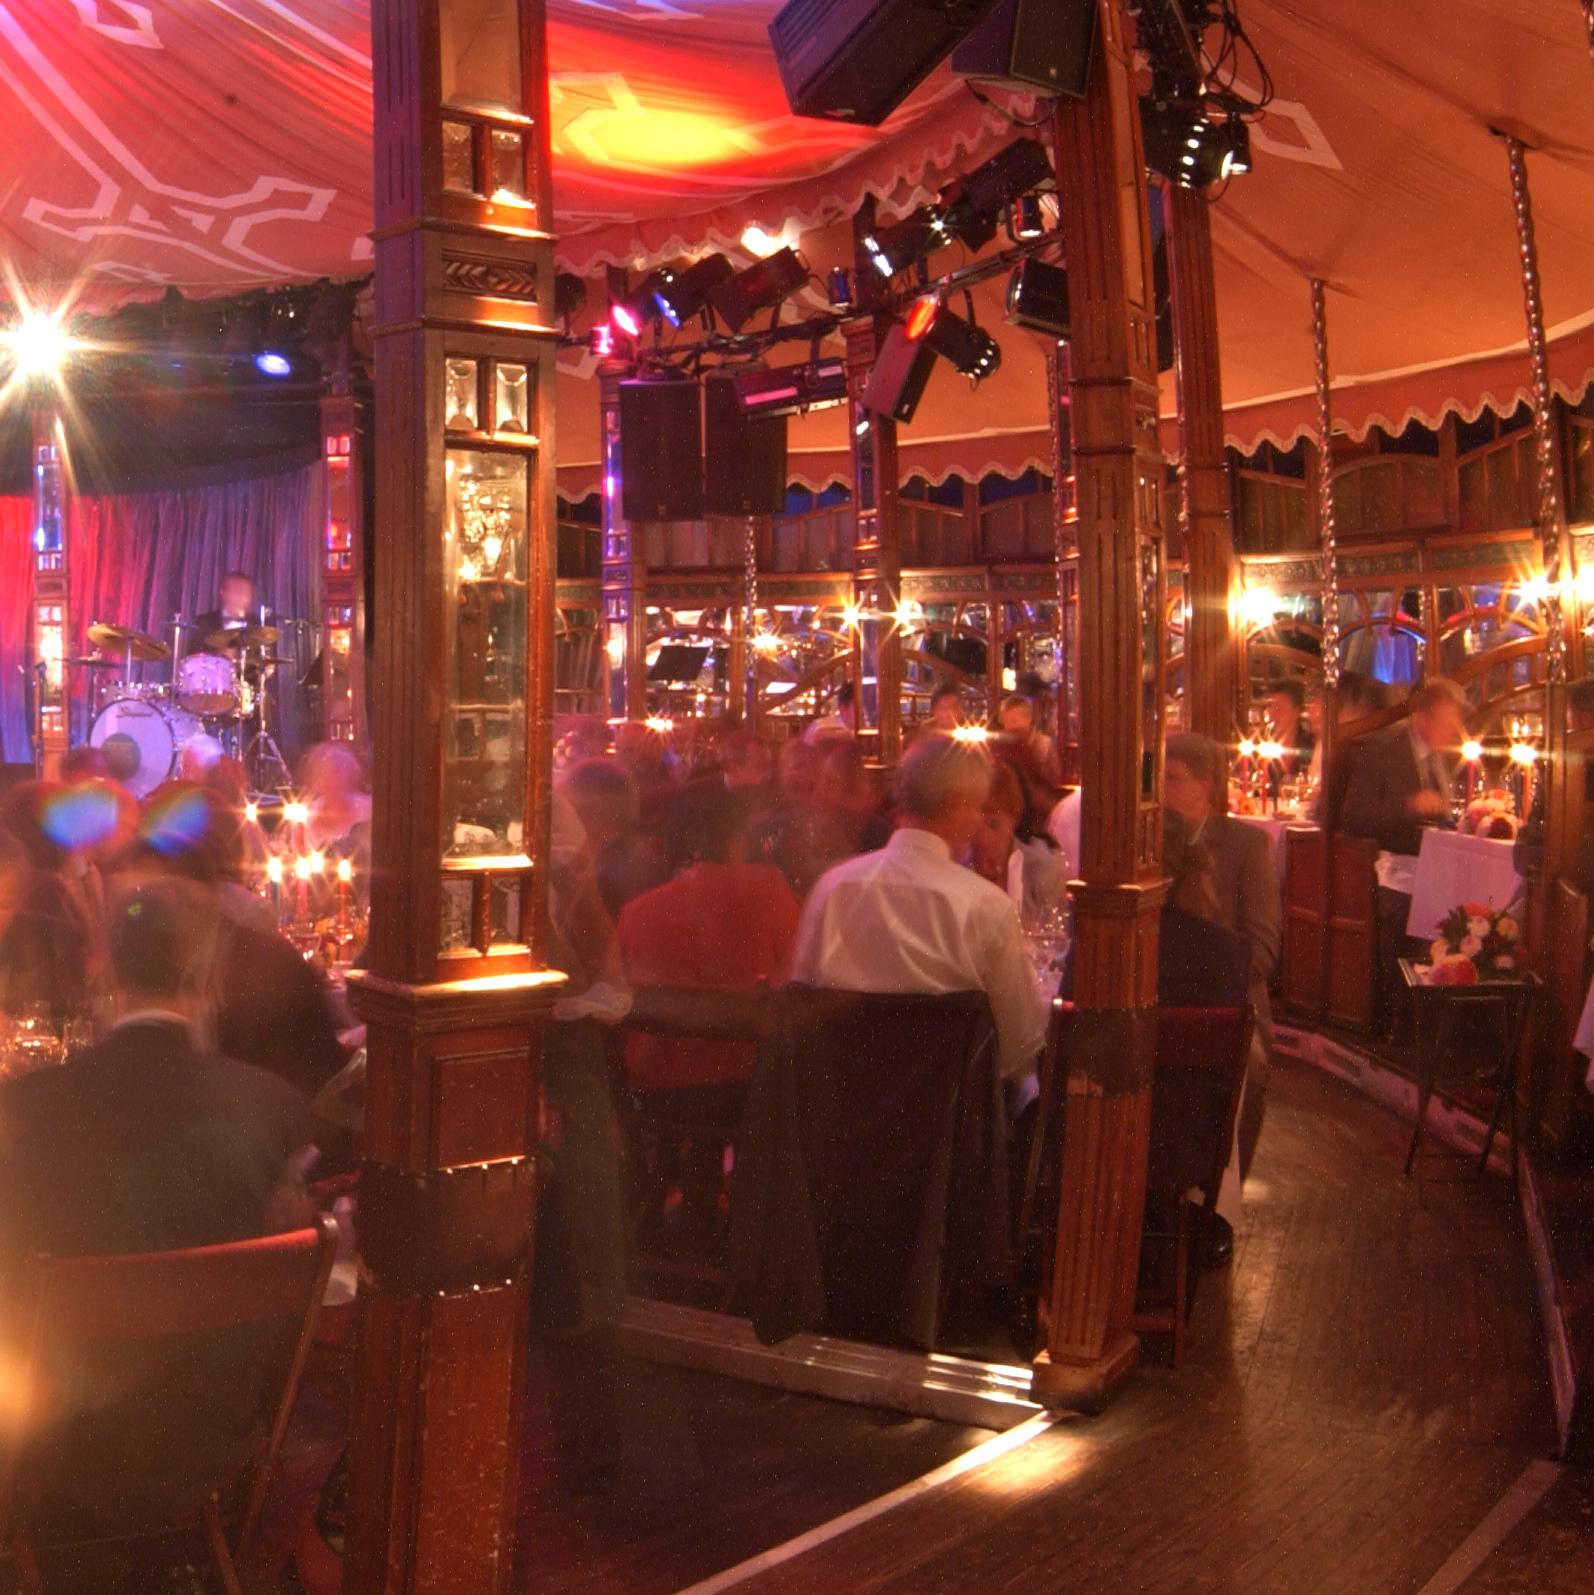 Bar-Jeder-Vernunft-Berlin-Konzerte